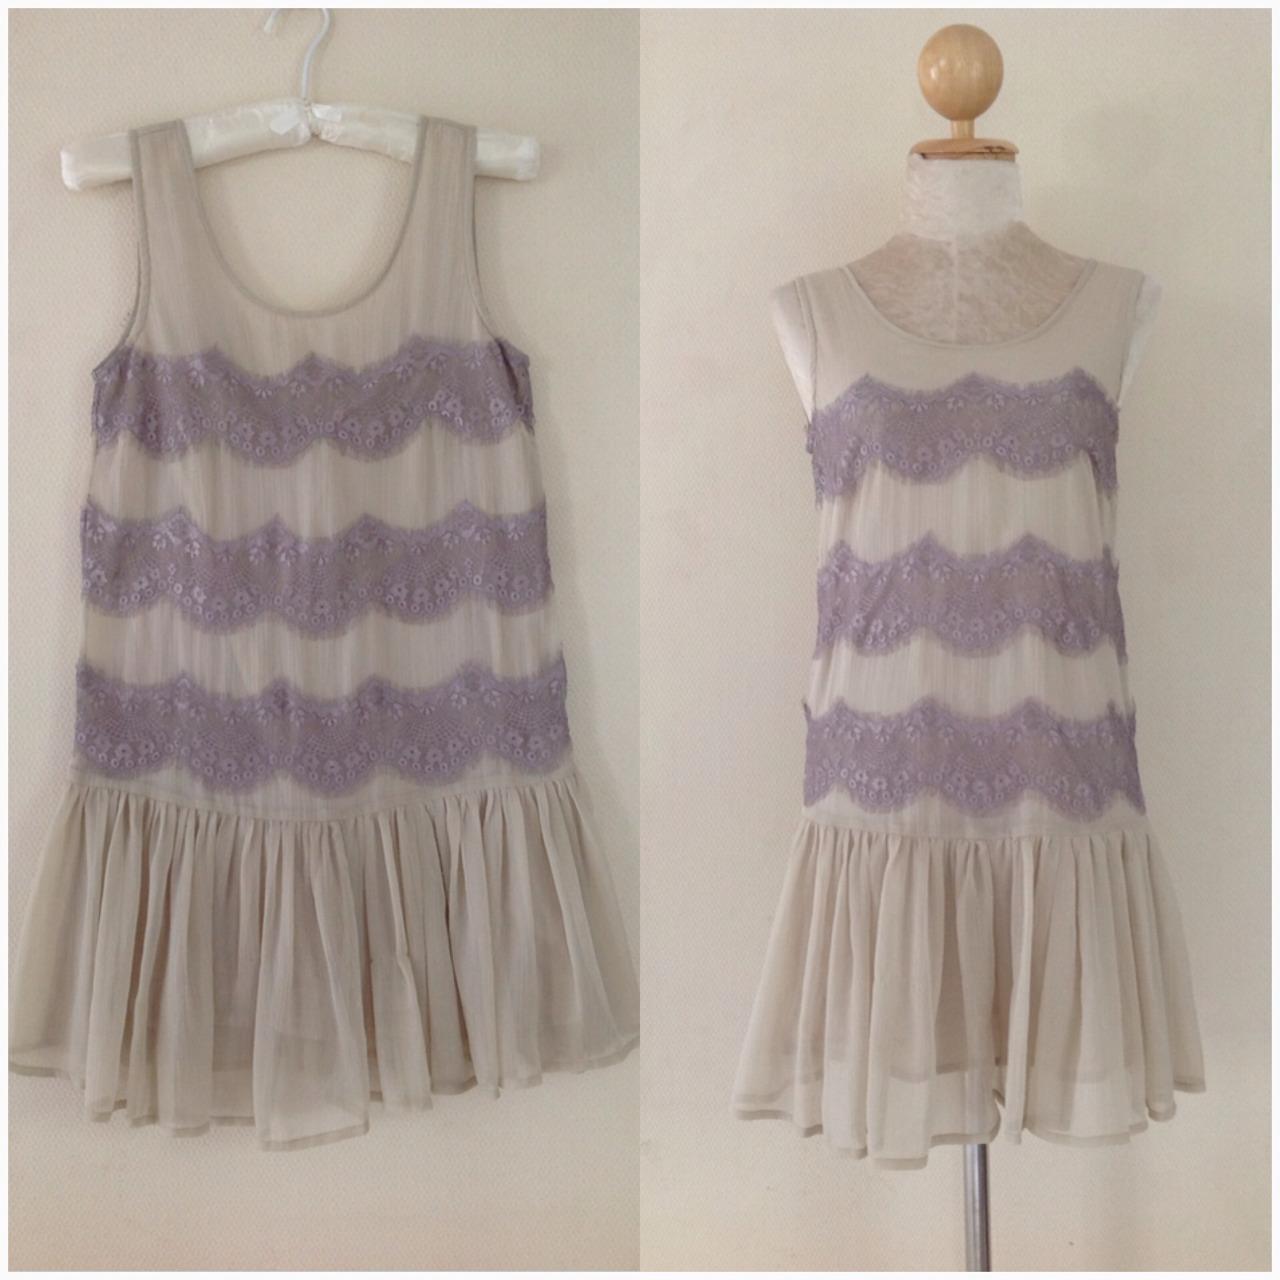 Dress ยี่ห้อ topshop รุ่น vintage style พร้อมส่ง uk 8